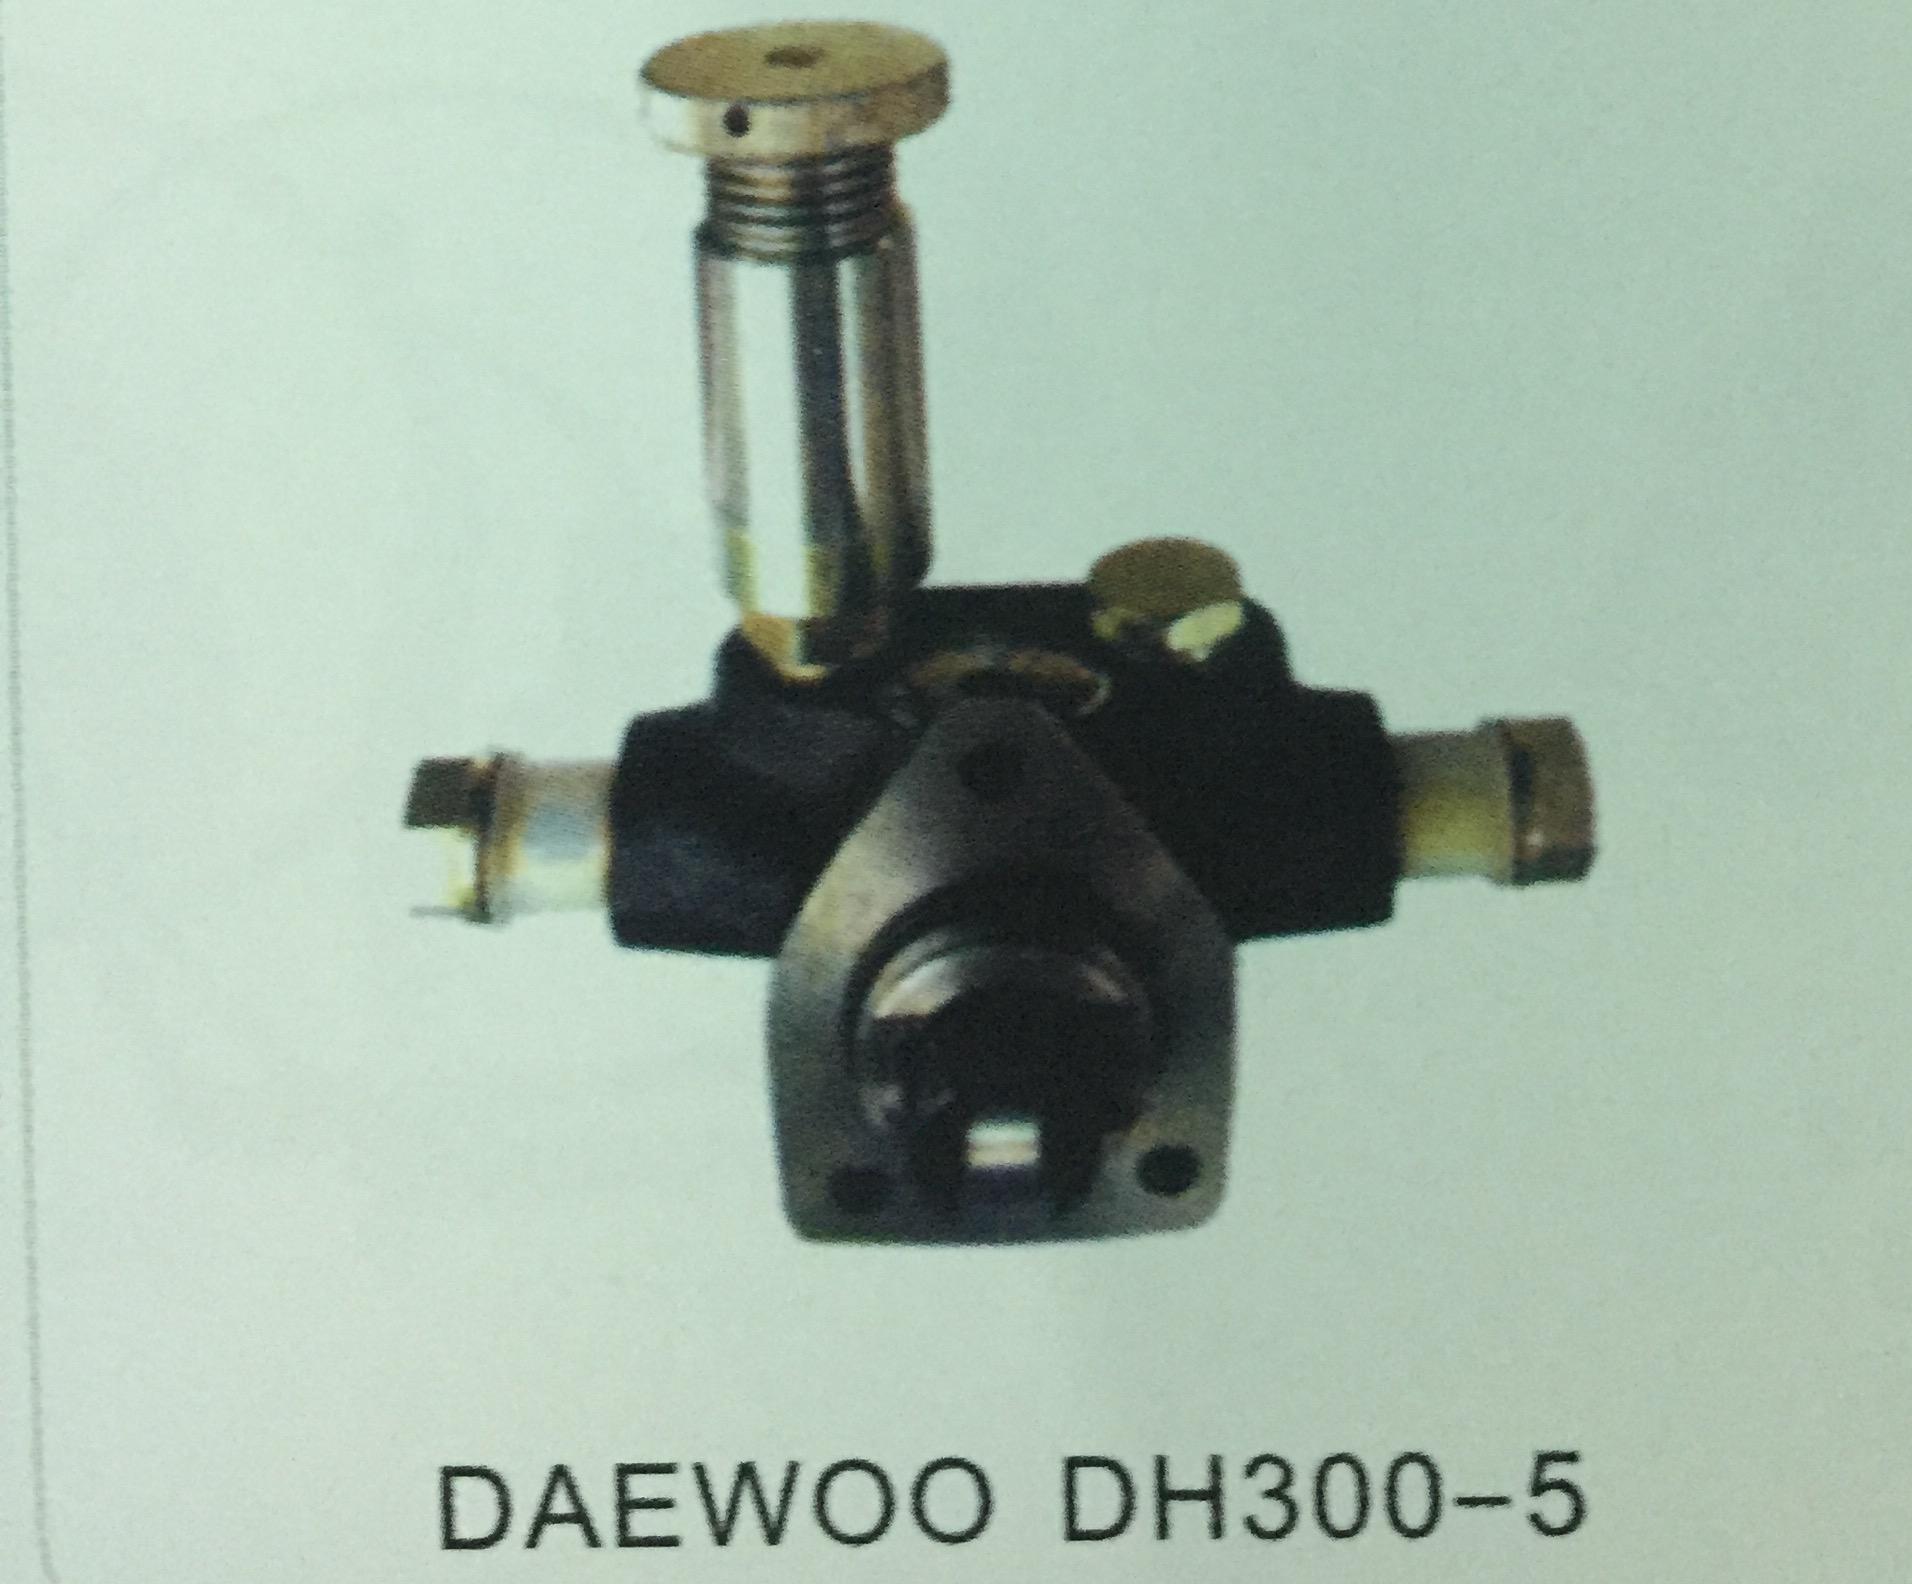 BƠM PHUN NHIÊN LIỆU DEAWOO DH300-5